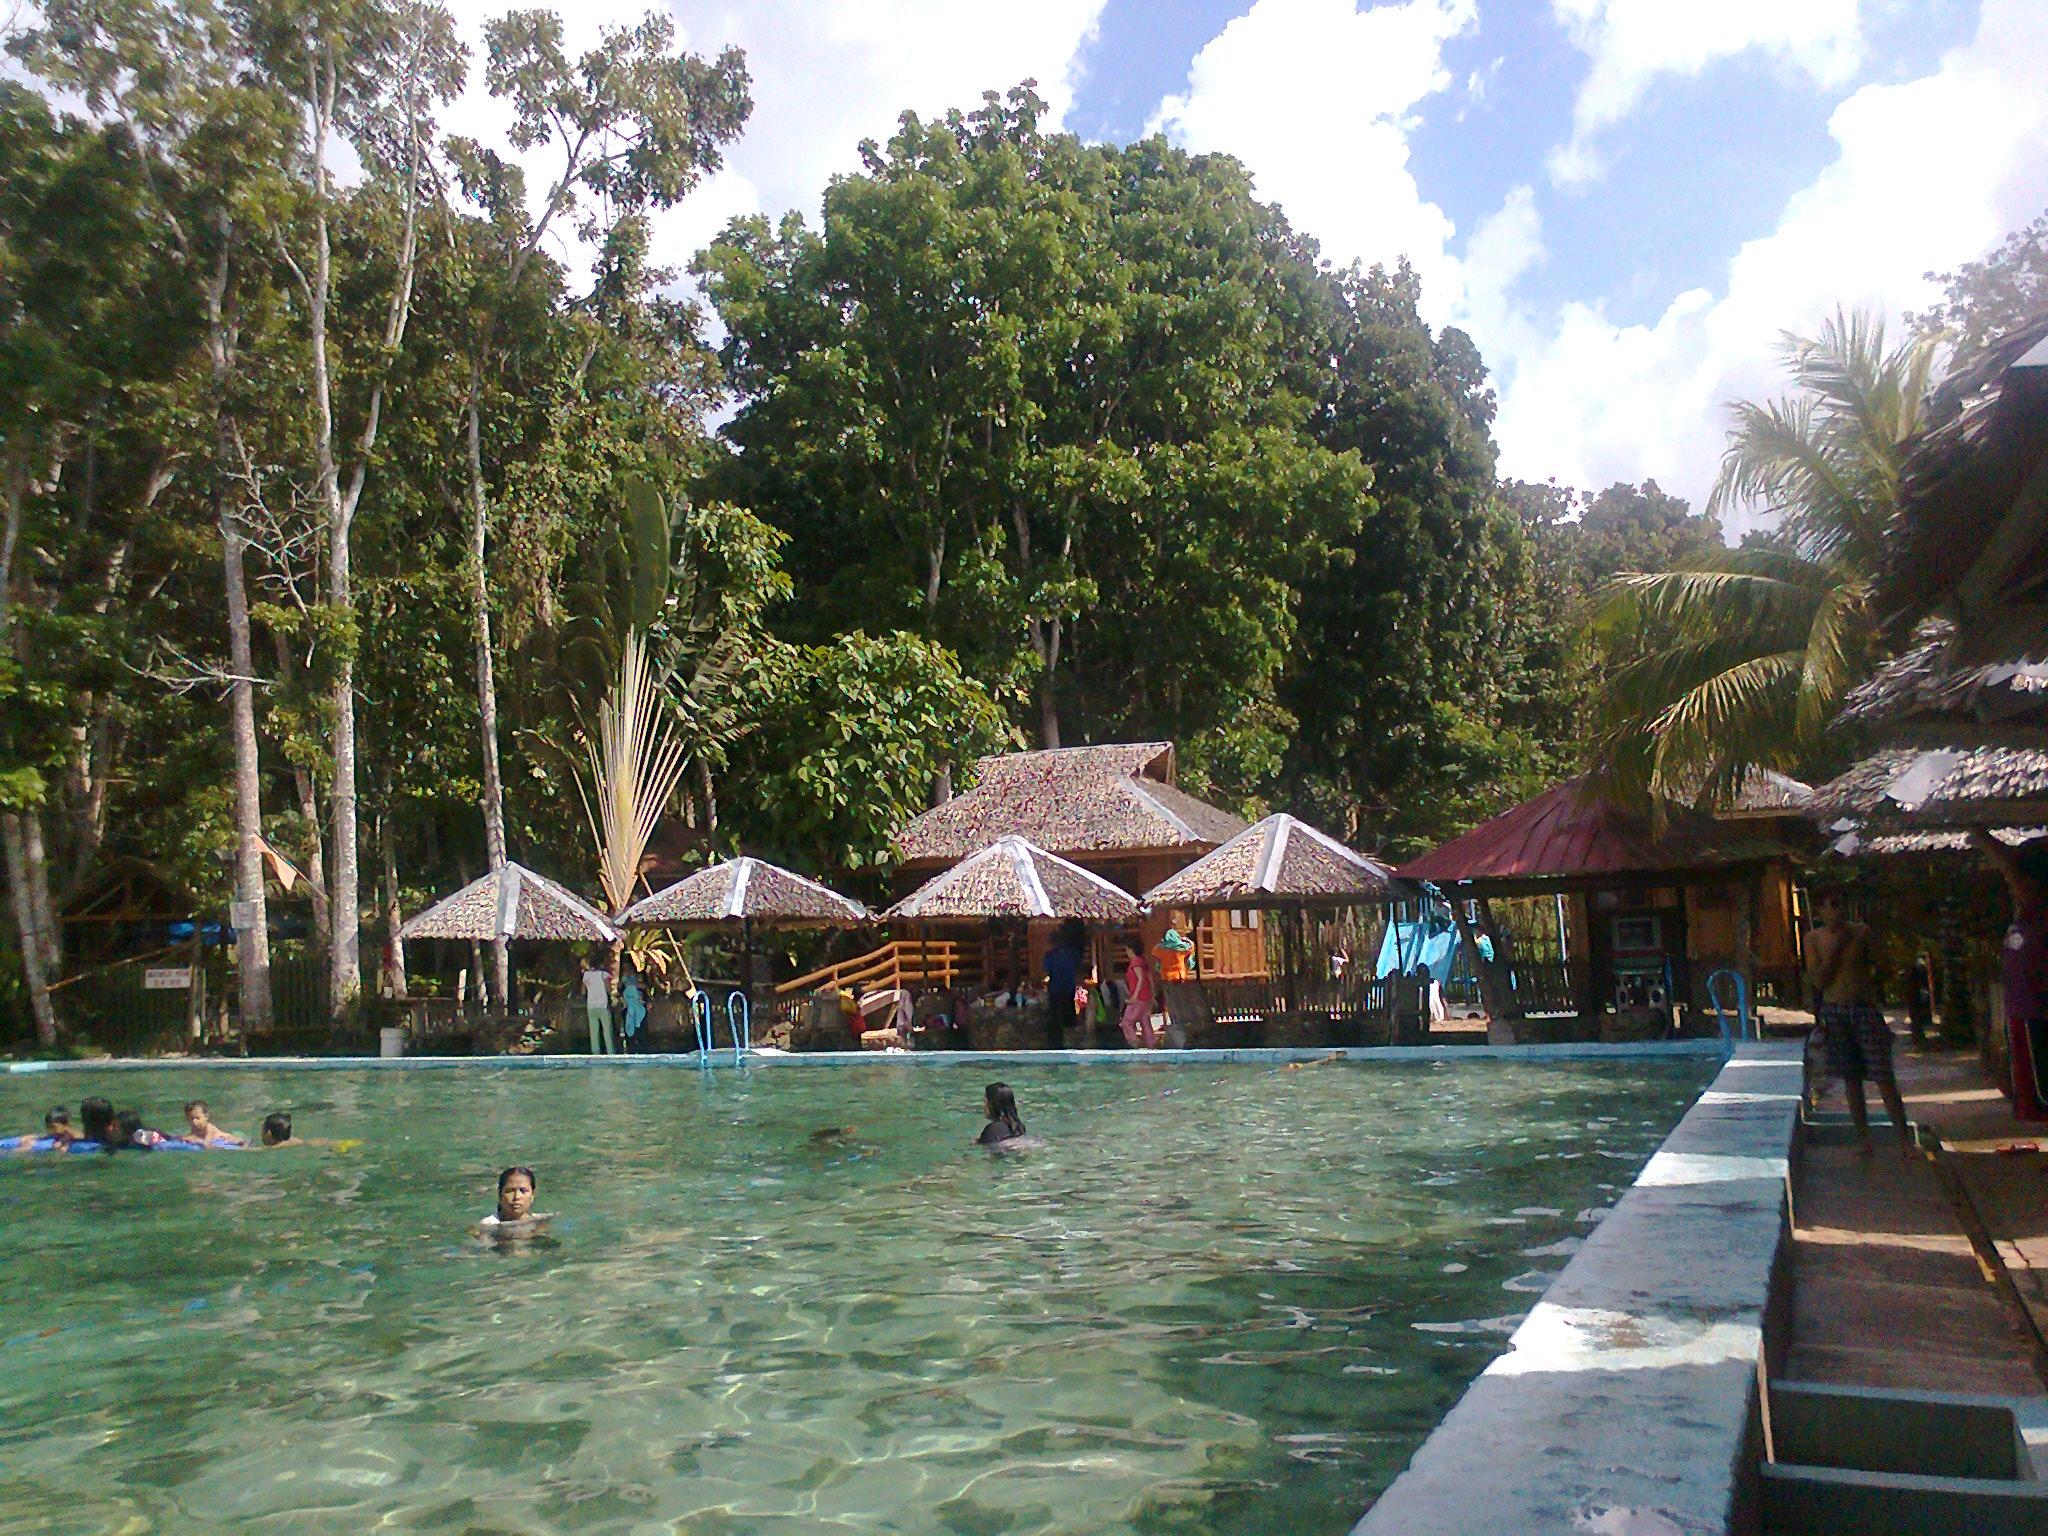 File Swimming Pool Area Of Isawad Resort Of Menzi Isabela City Basilan Universal Stewardship